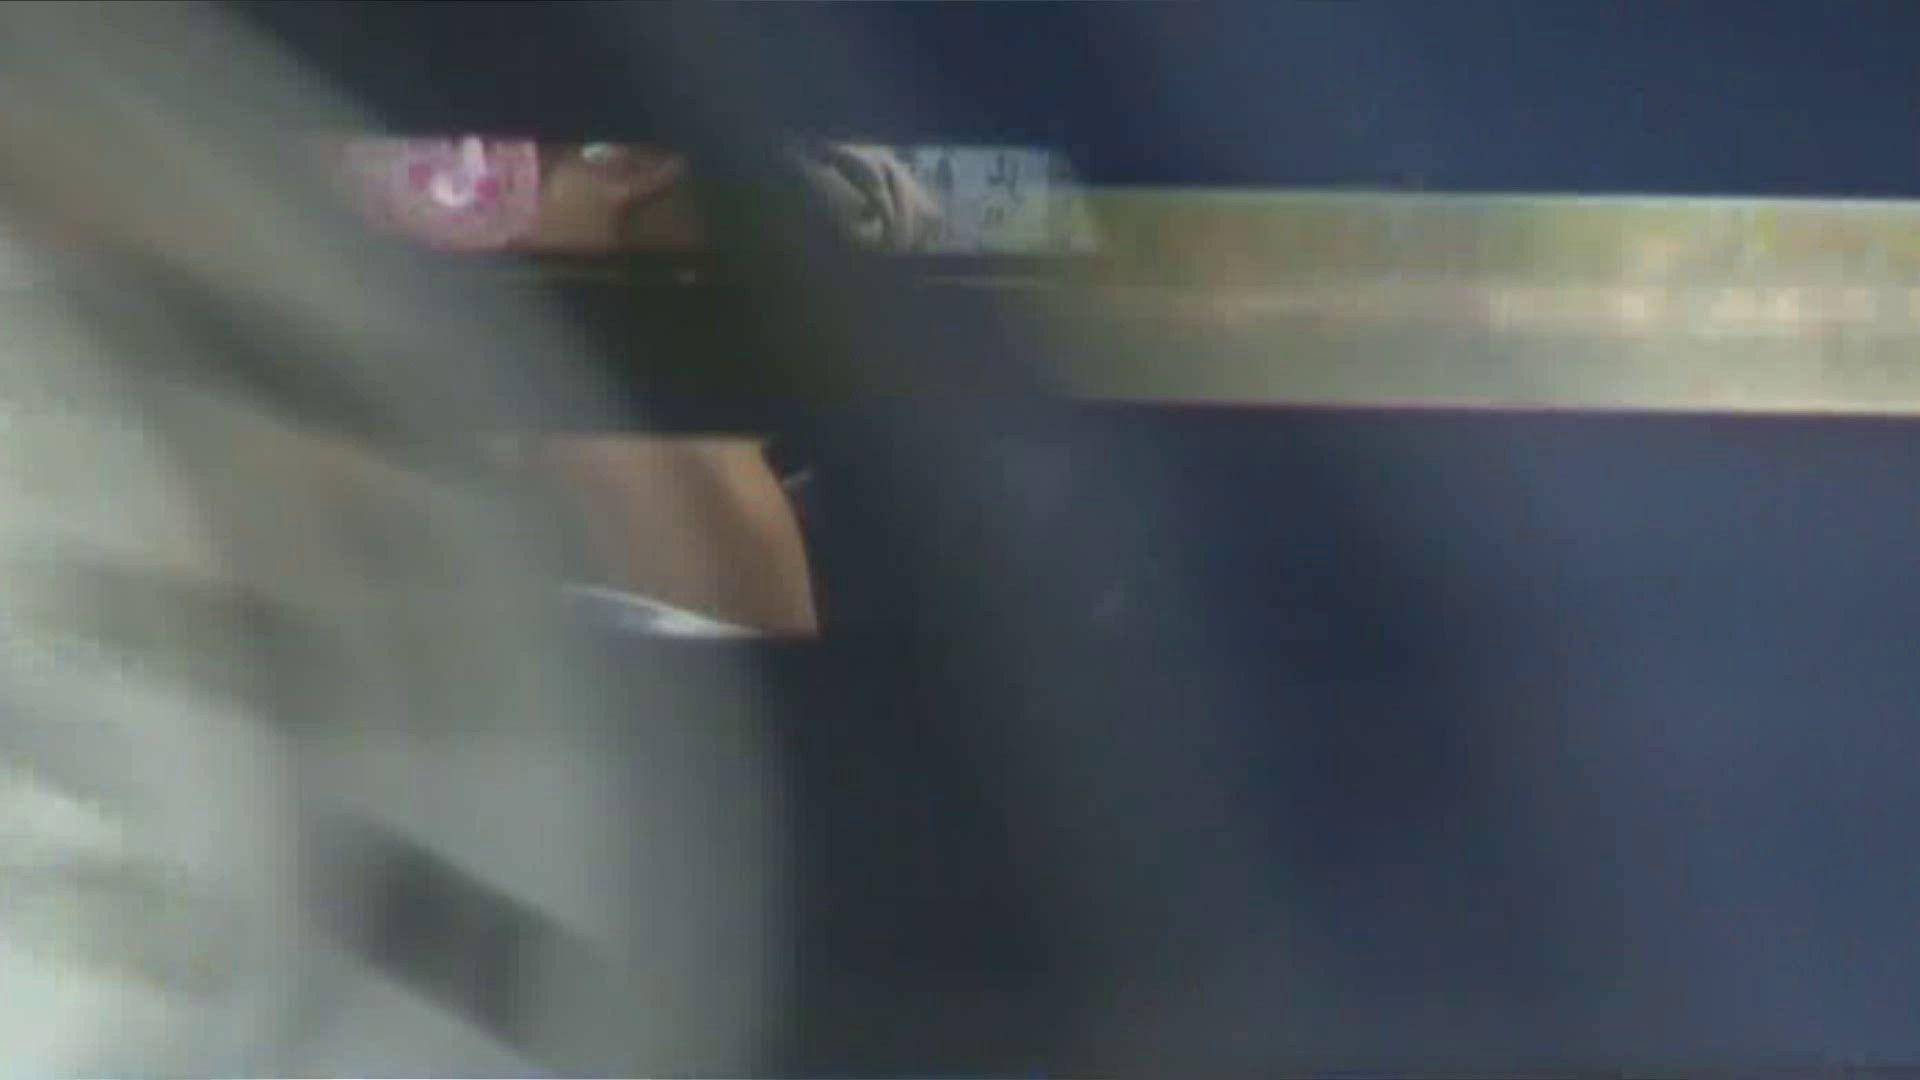 望遠パンチラNo3 学校潜入 盗撮動画紹介 83PIX 73